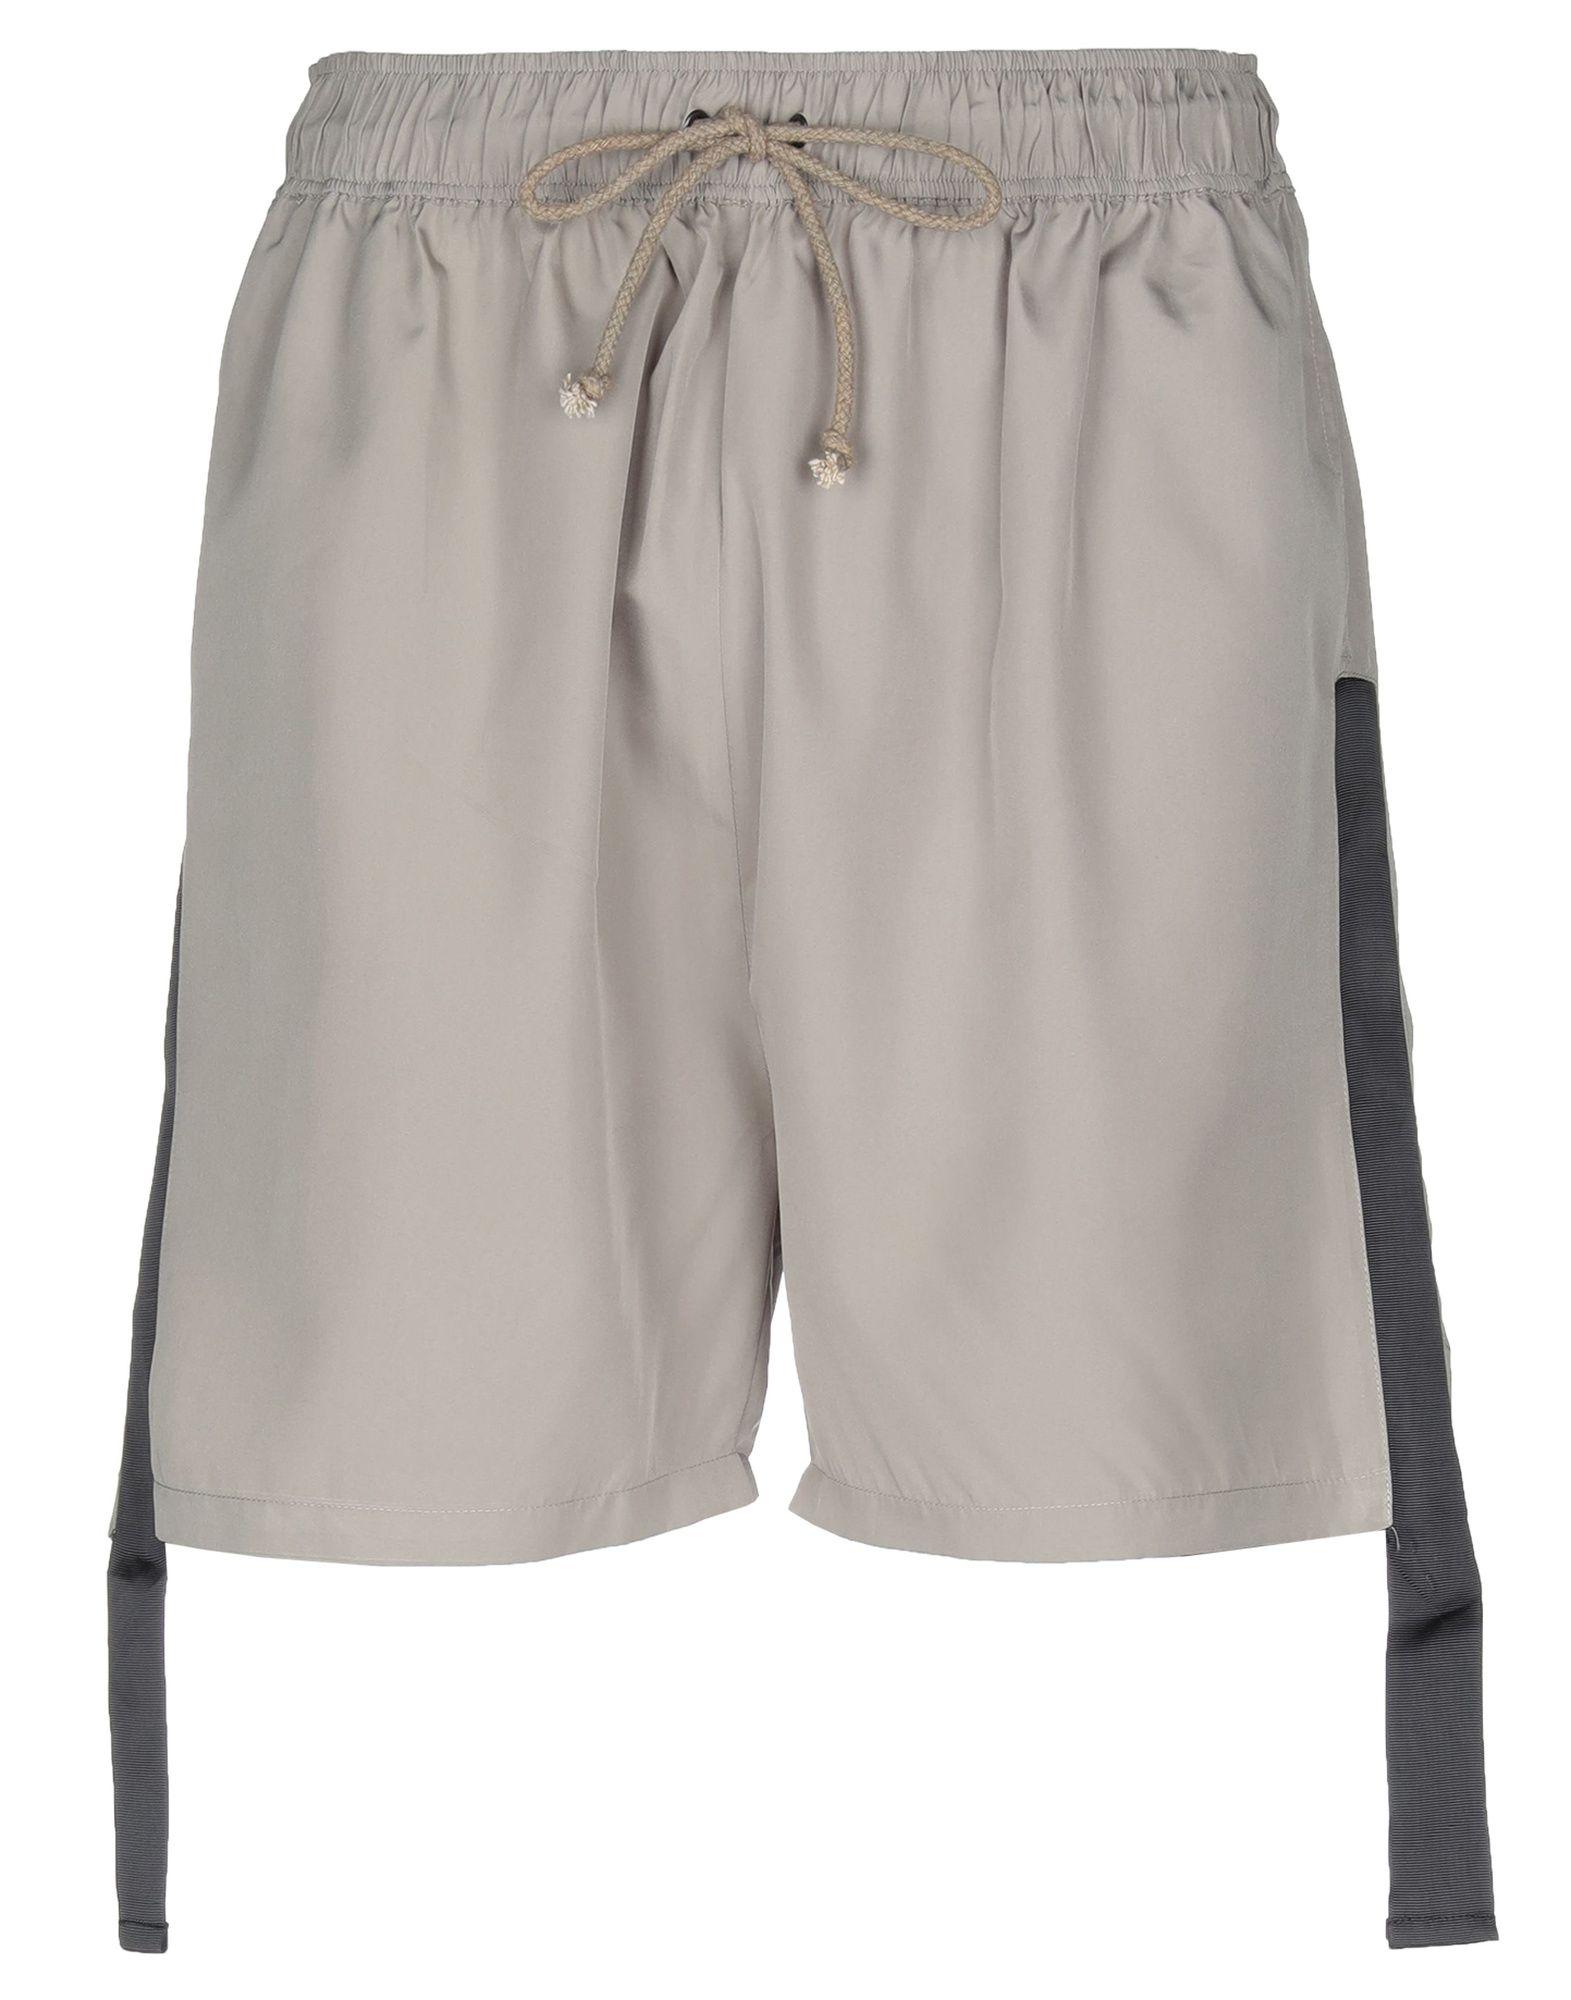 Shorts & Bermuda Tourne De Transmission uomo - 13301690TO